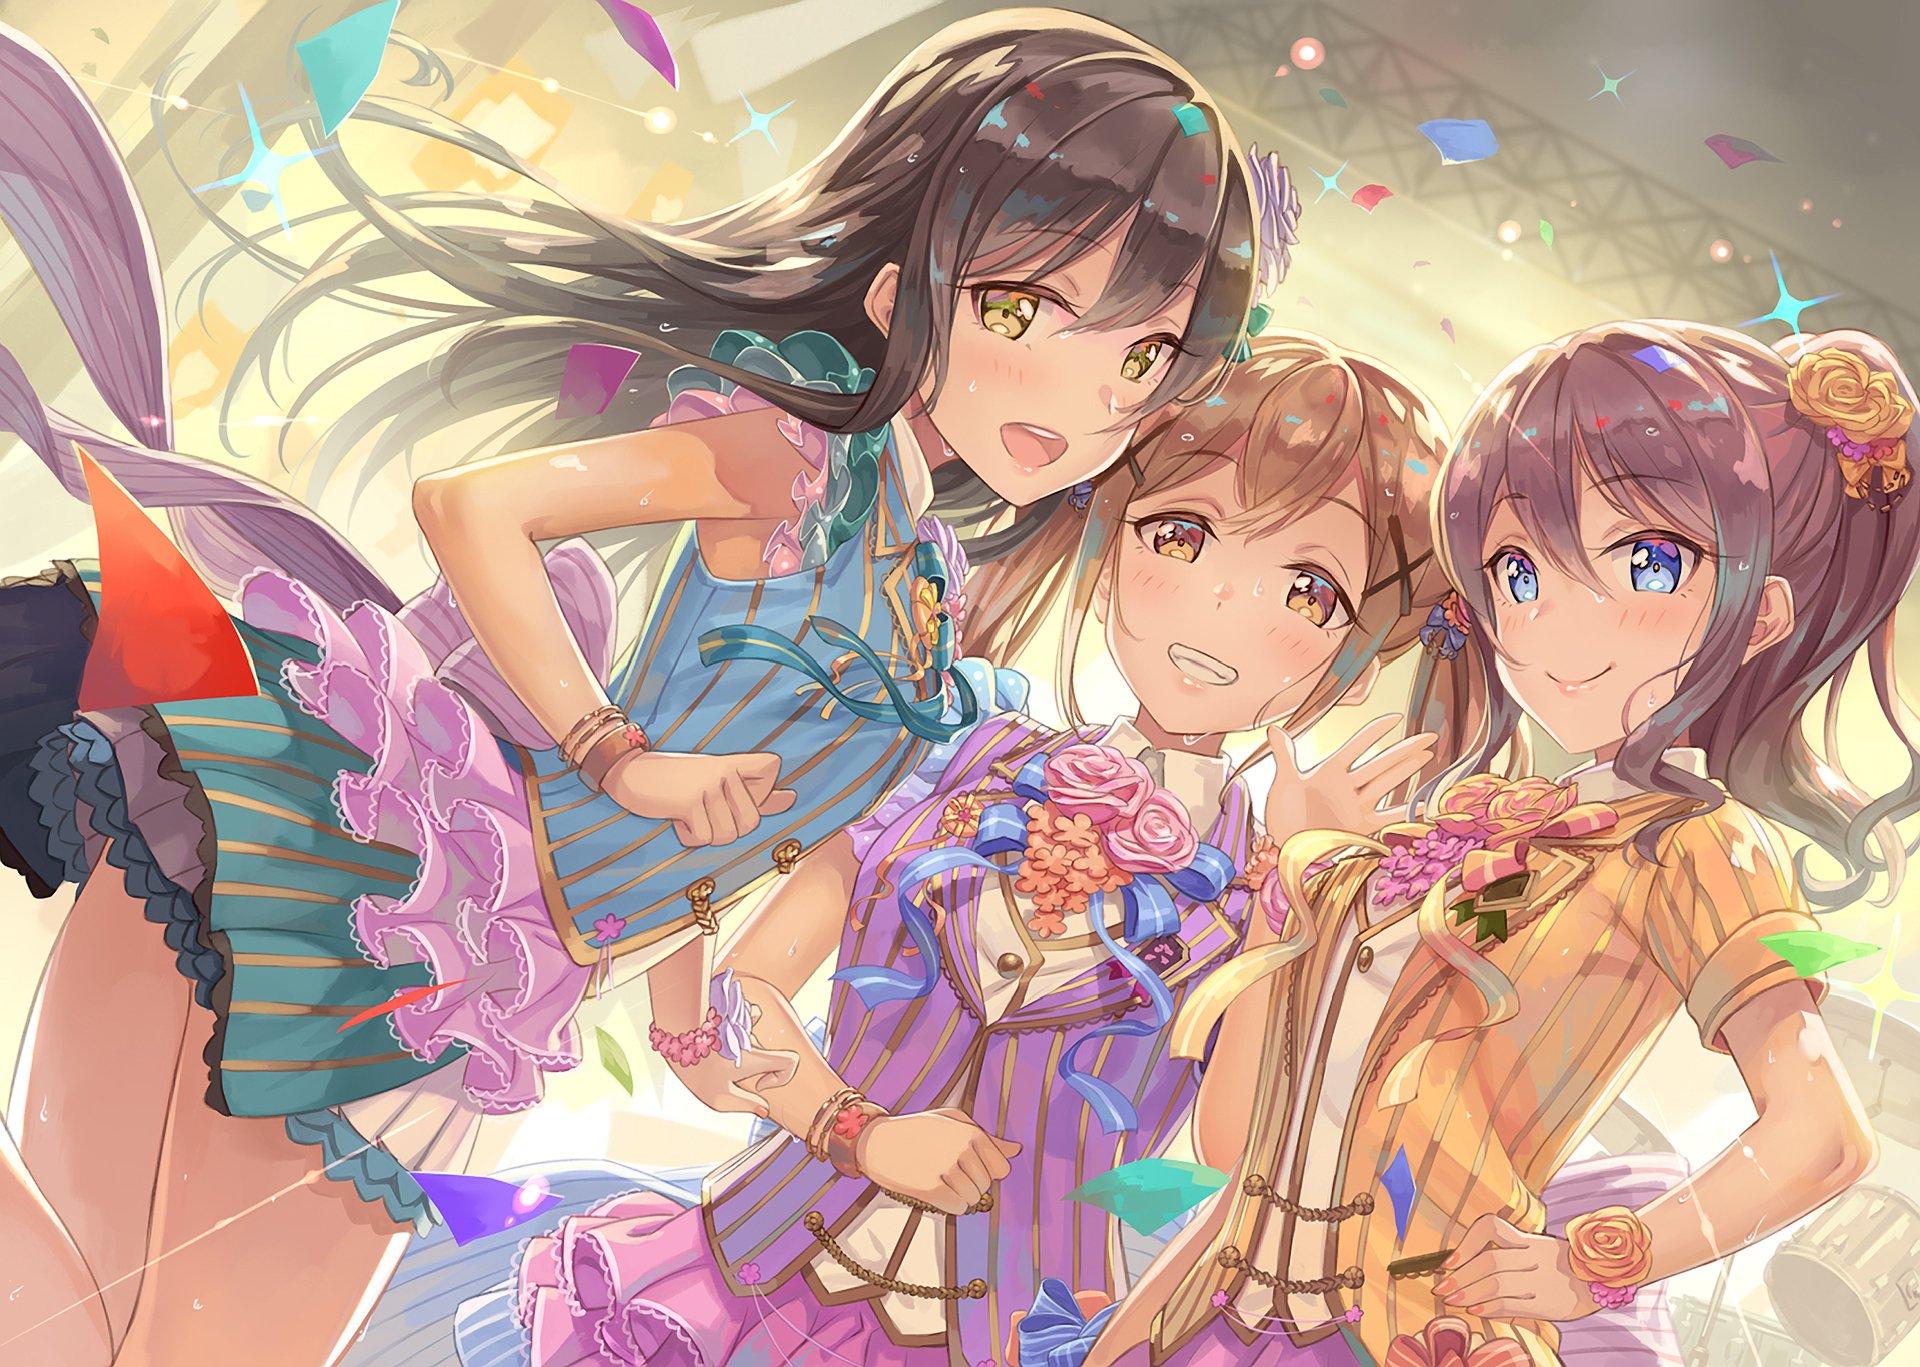 Resultado de imagen de bang dream anime wallpapers